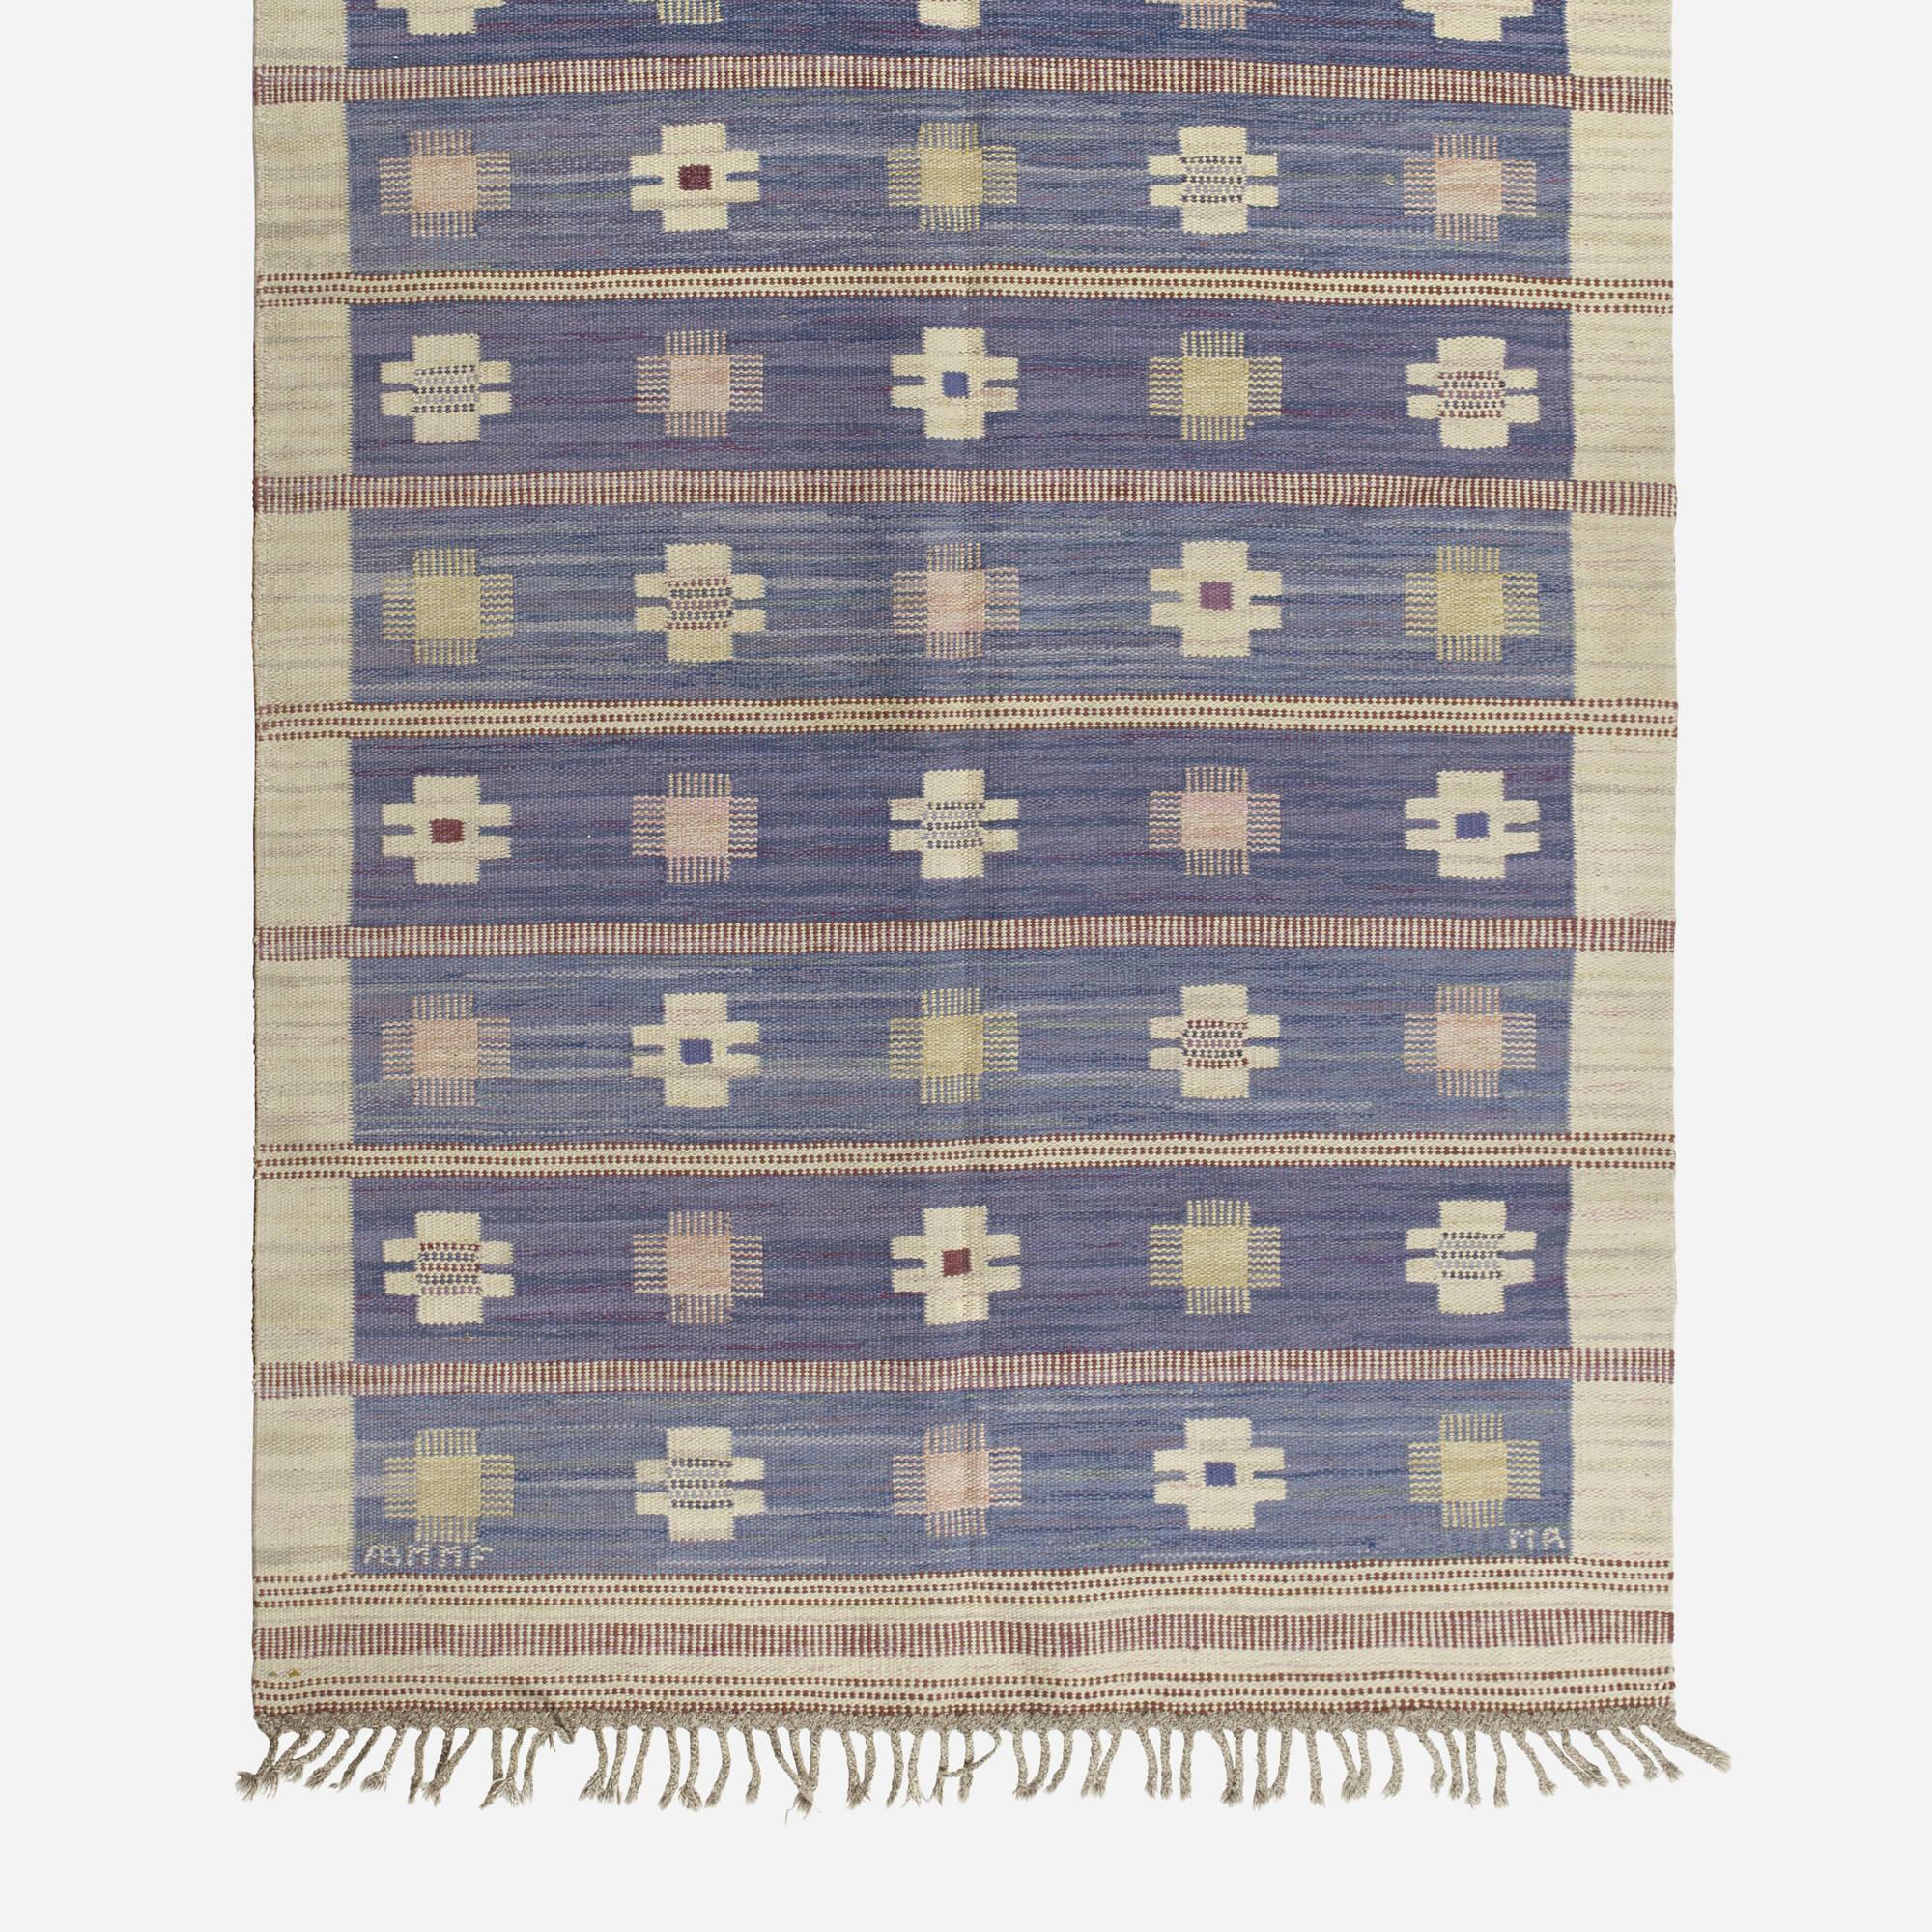 190: Marianne Richter / Blåklint flatweave carpet (2 of 2)